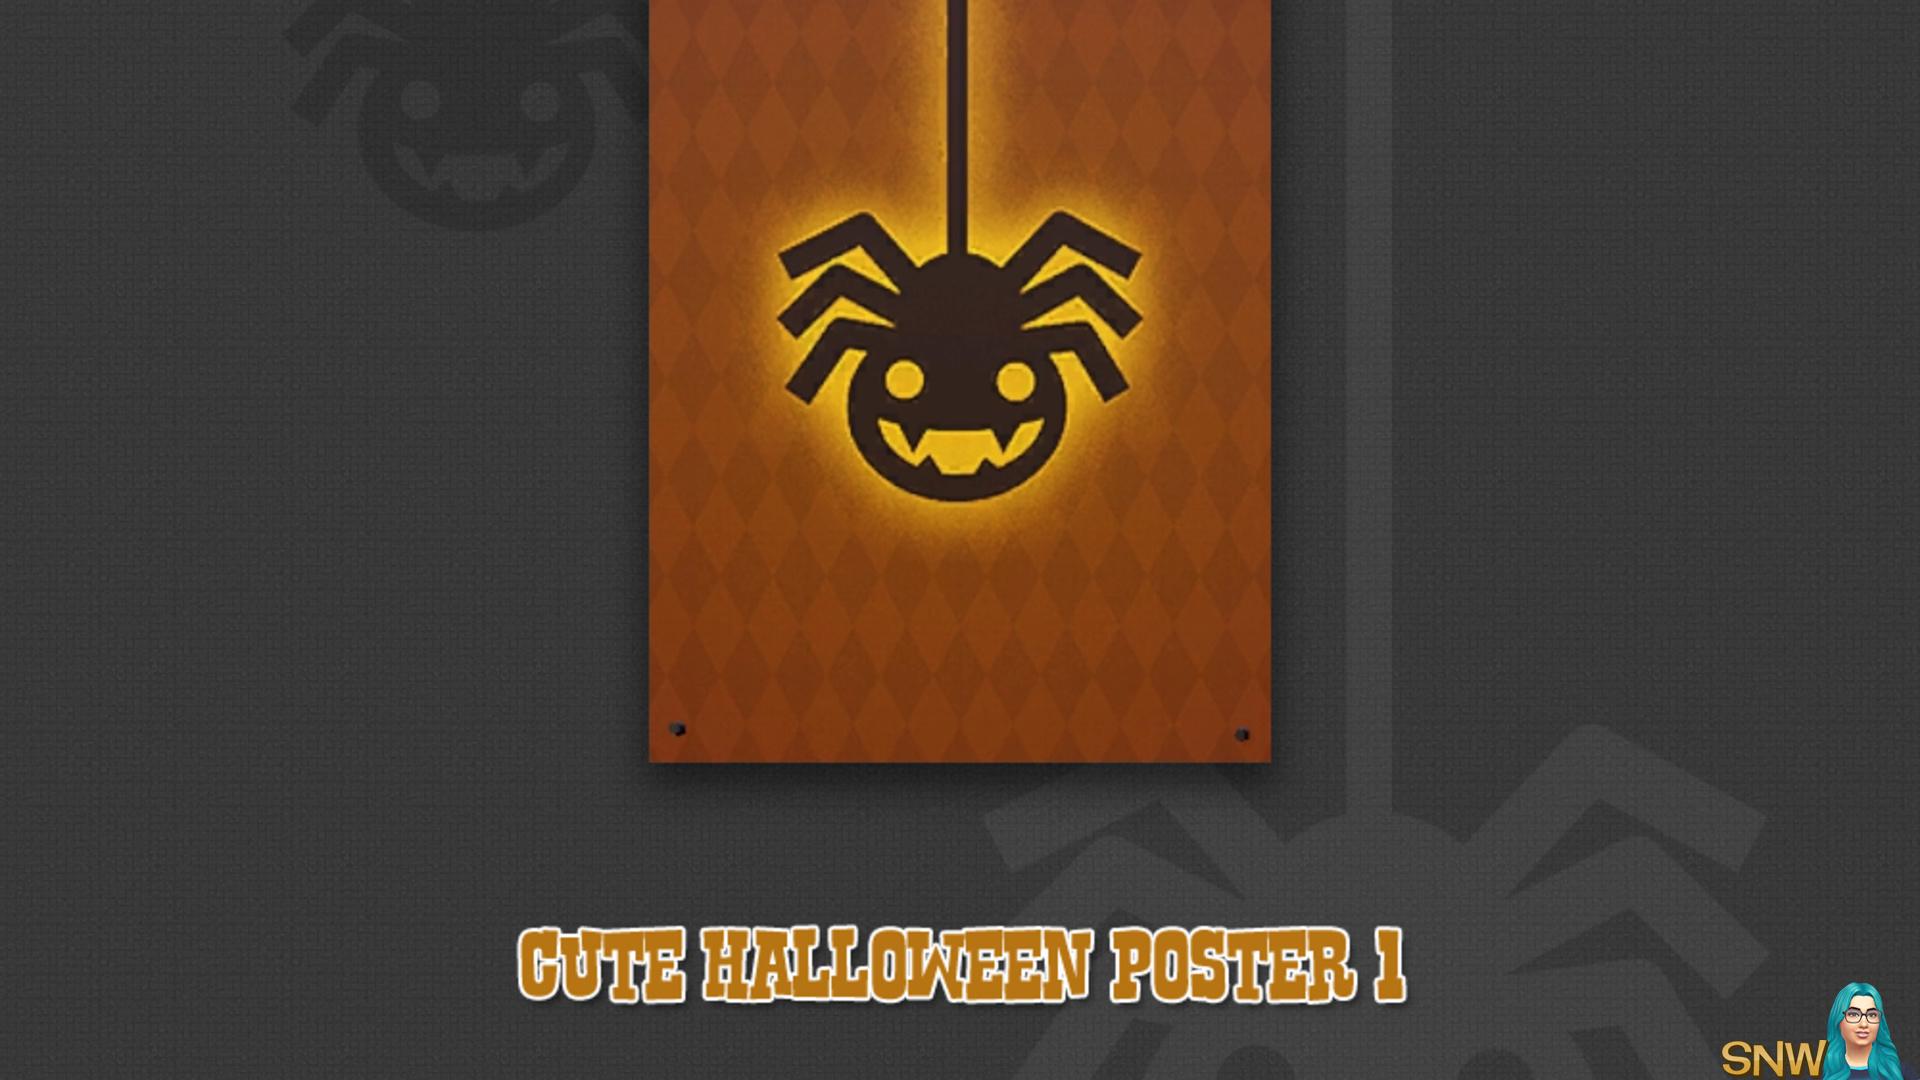 Cute Halloween poster #1 (Spidey)